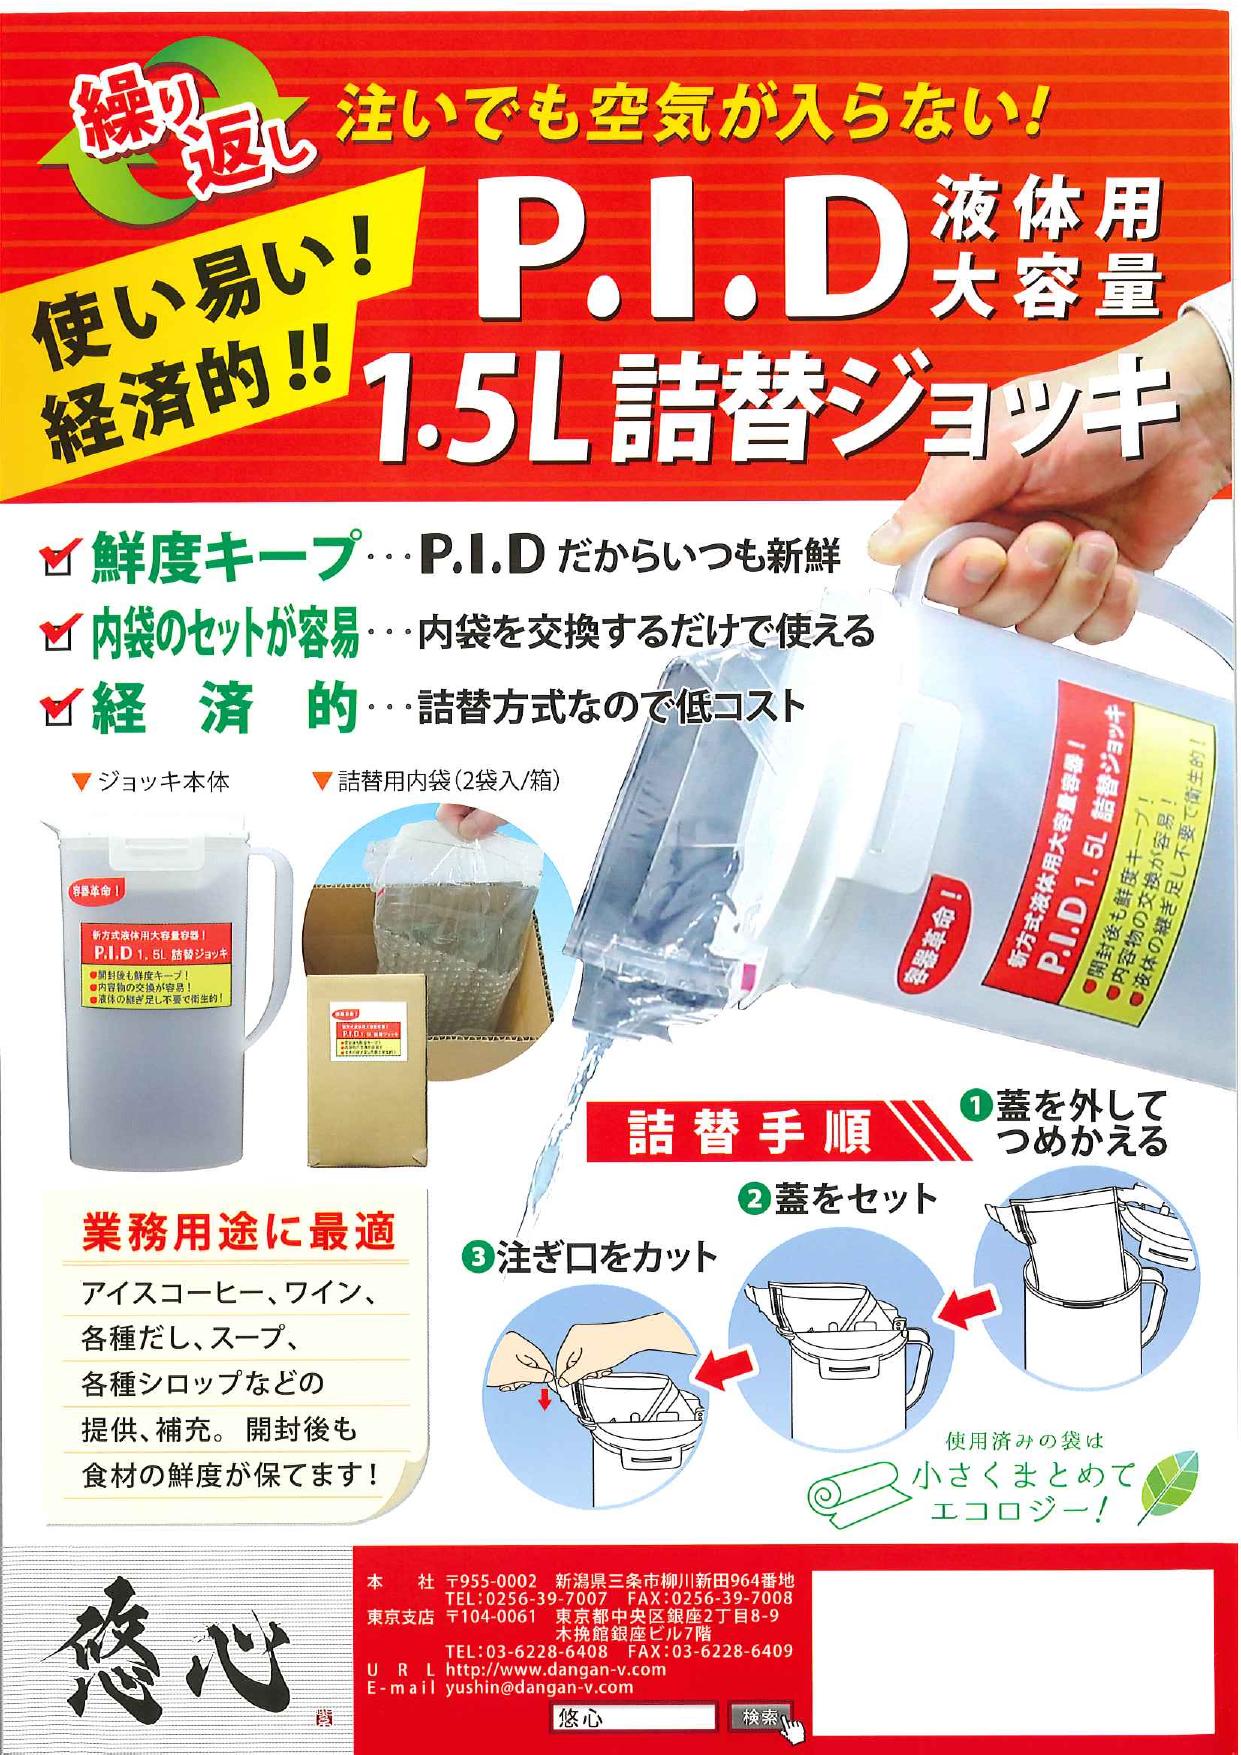 P.I.D 液体用大容量 1.5L詰替ジョッキ